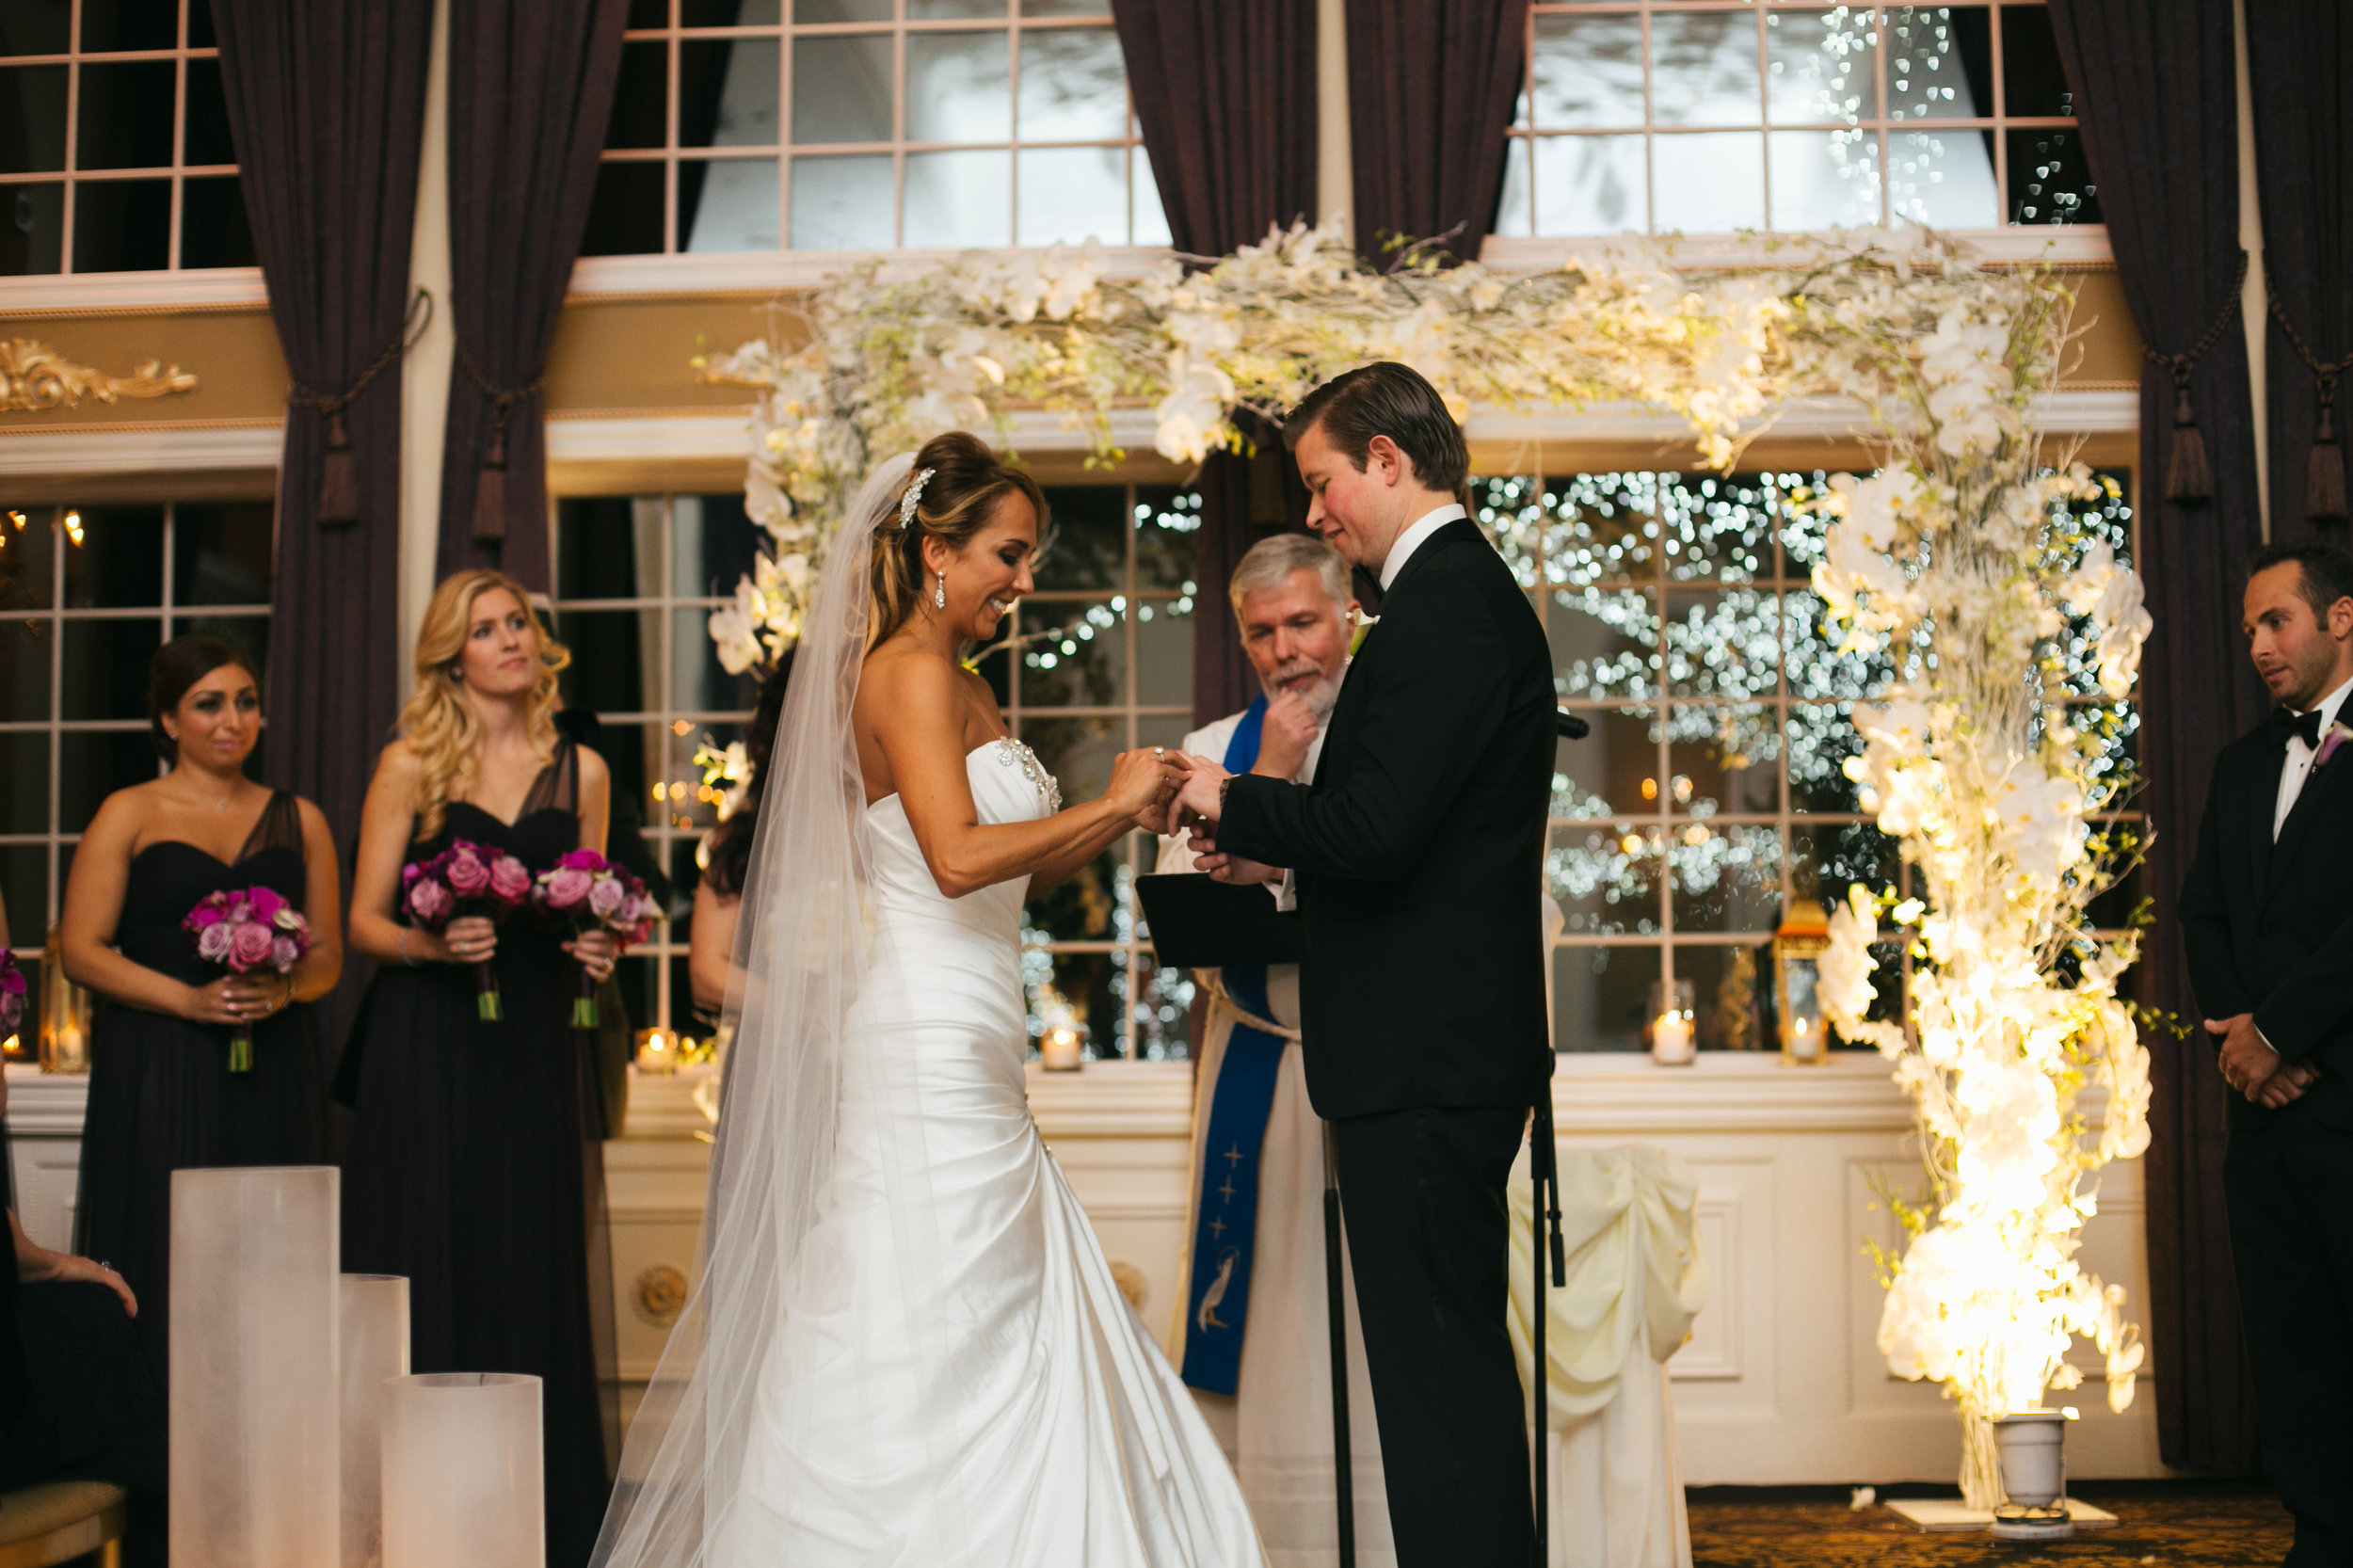 Ceci_New_York_Custom_Invitation_ New_Jersey_Wedding_Luxury_Personalized_Ceci_Style_Bride_Foil_Stamping47.jpg